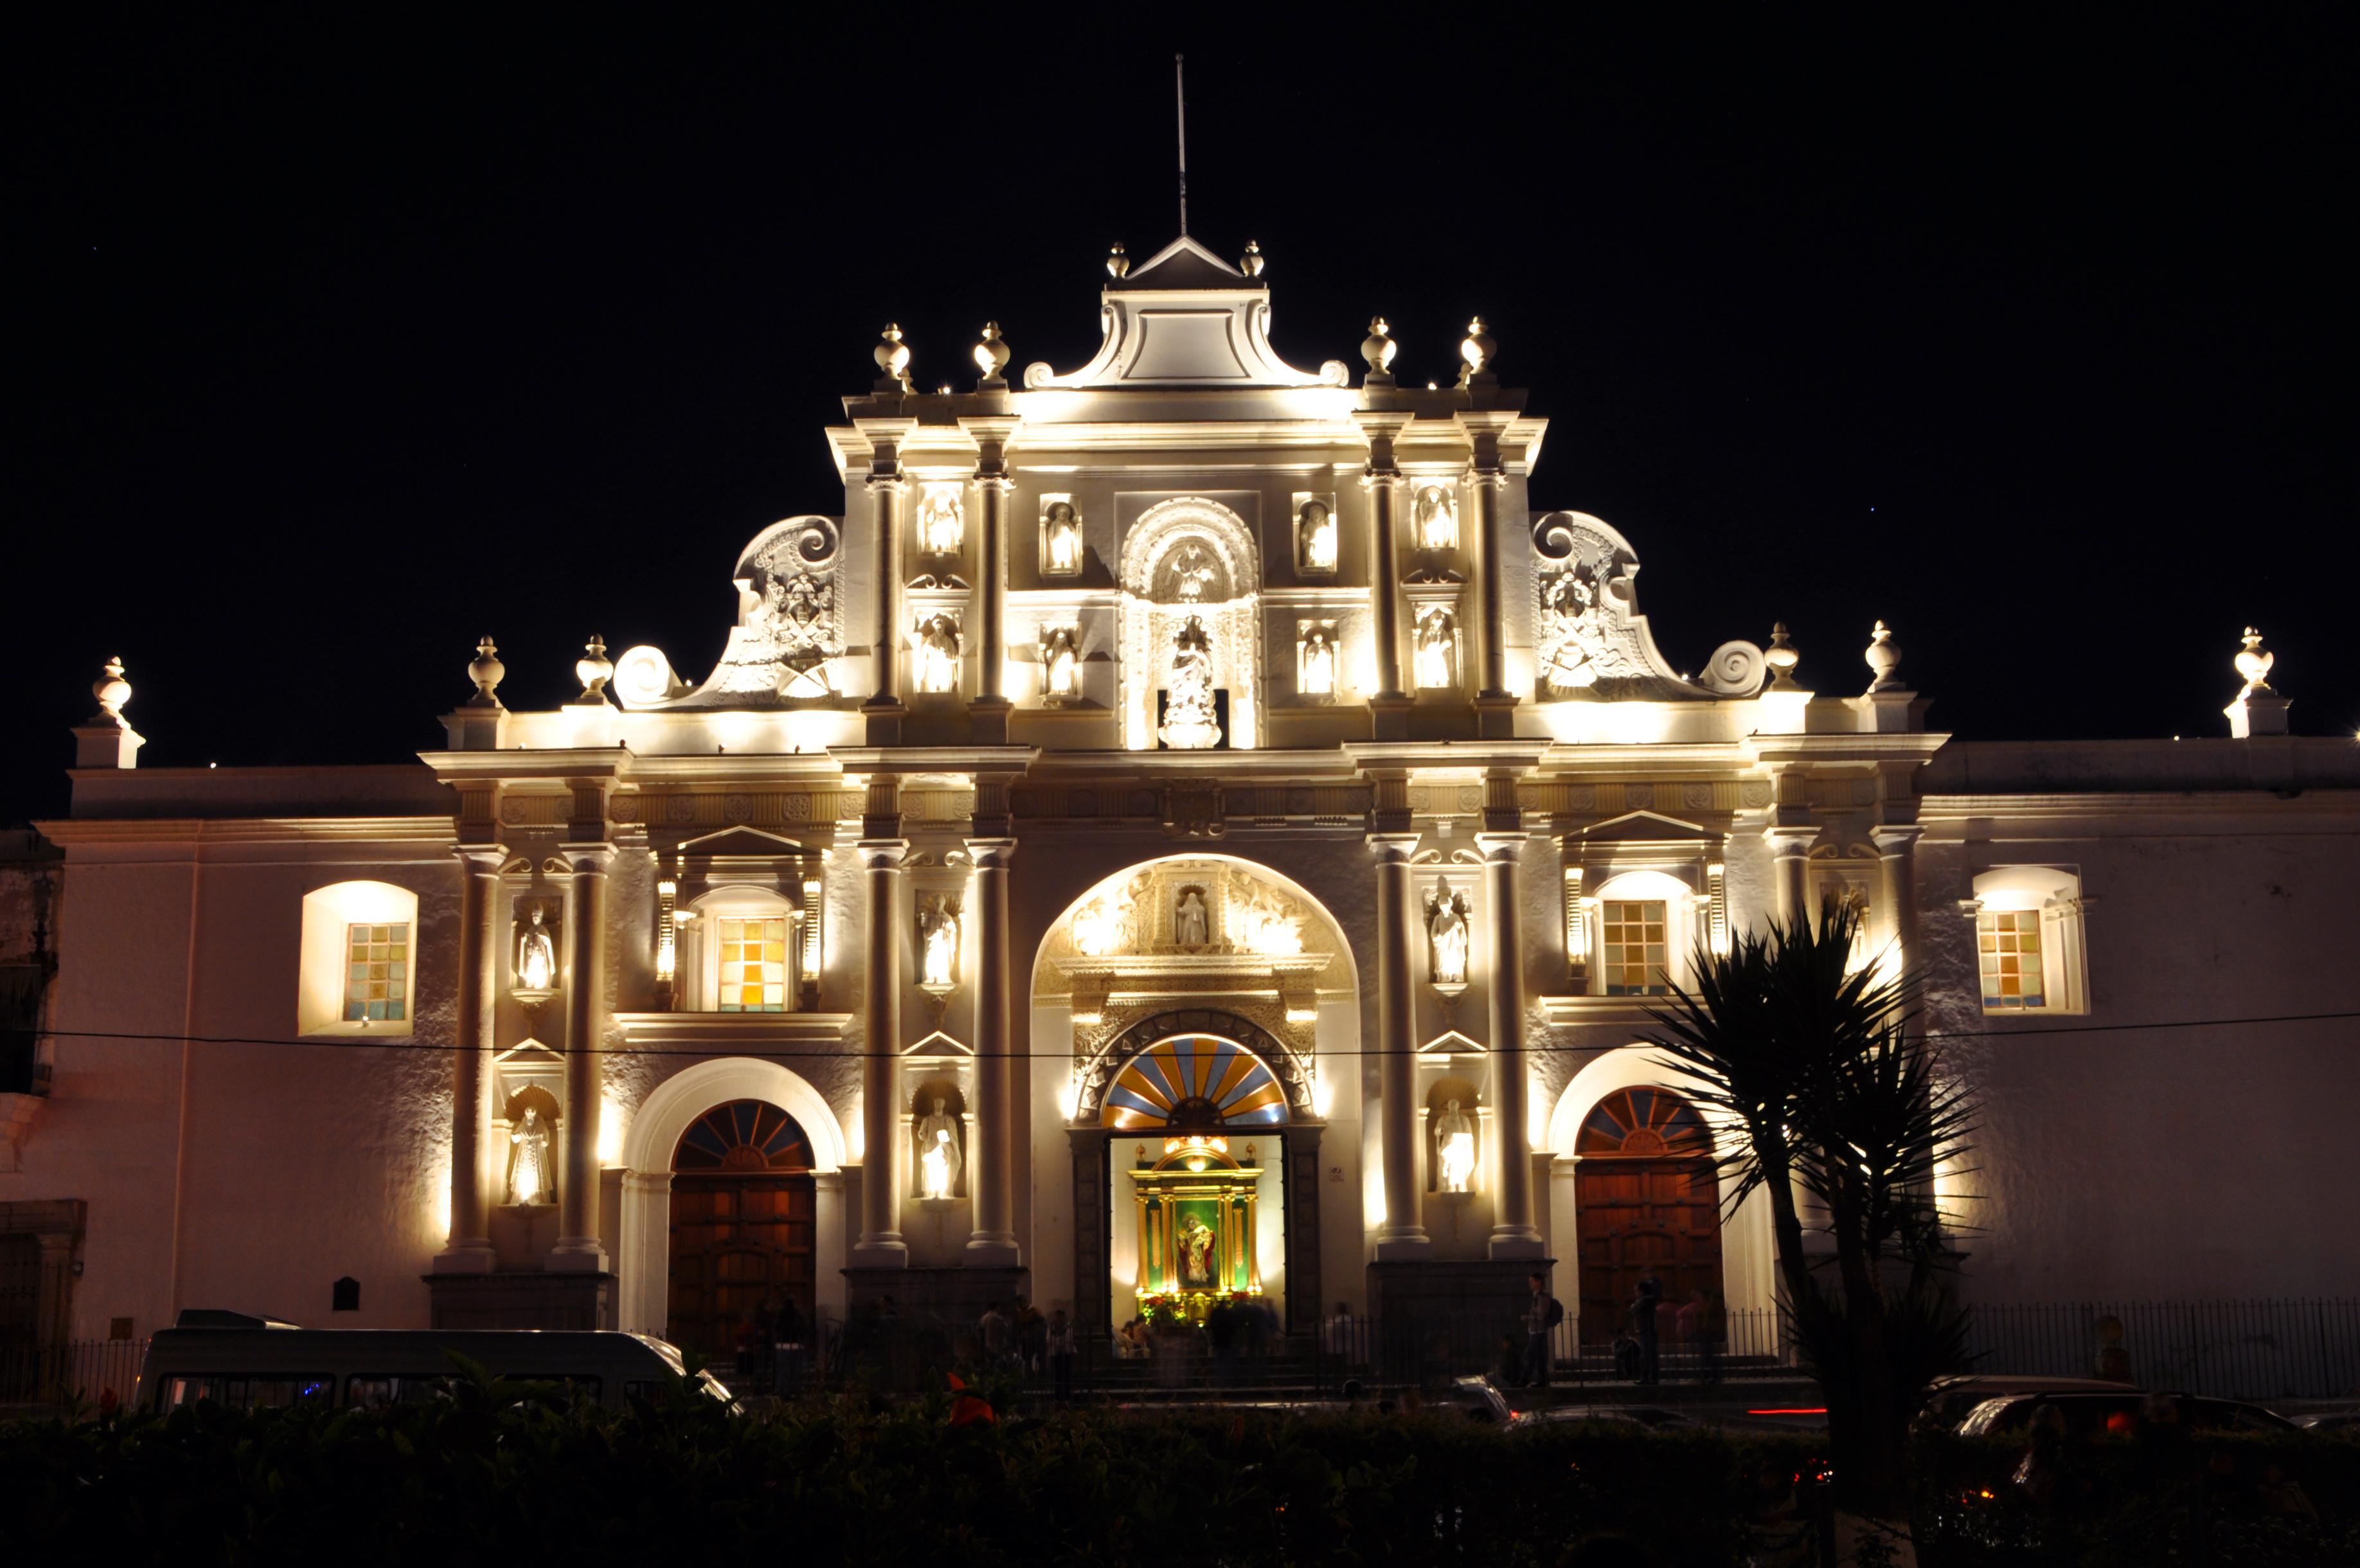 San Jose Catedral Antigua Guatemala File:san Jose Antigua